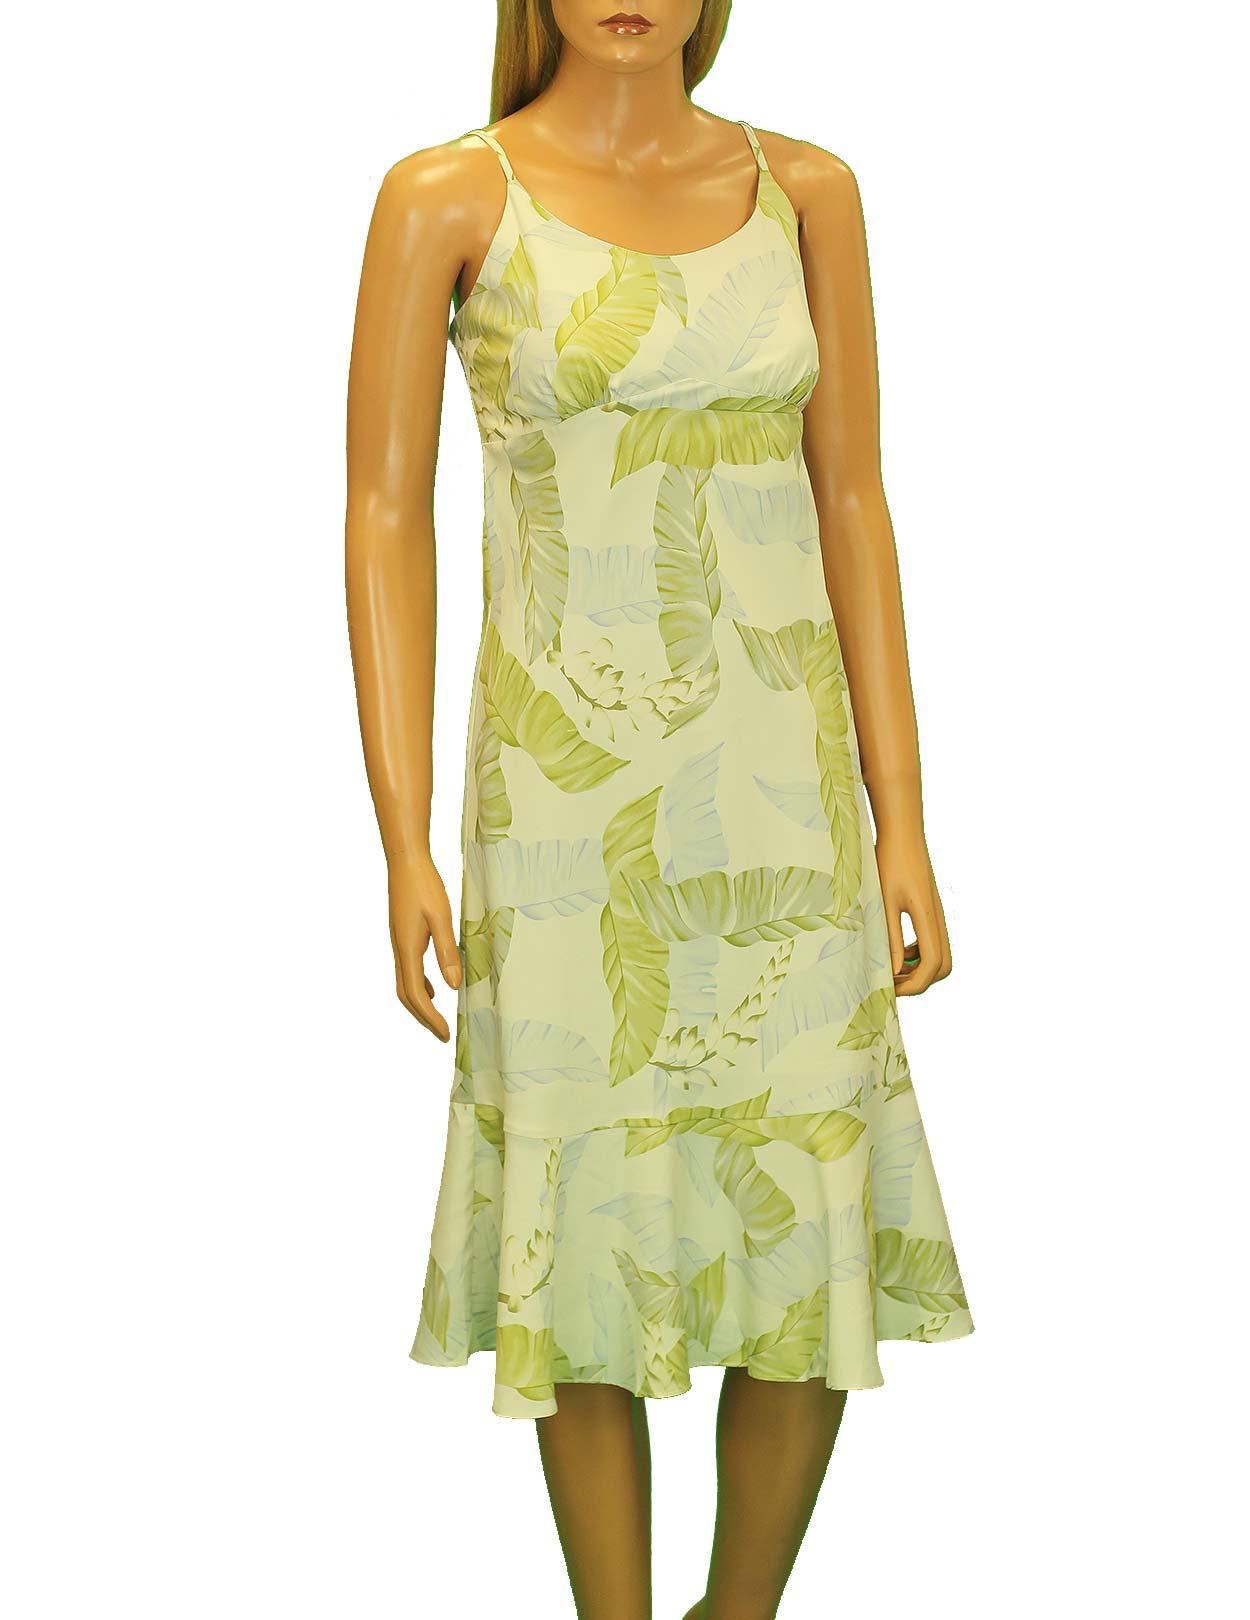 Silk Hawaiian Mid Green Dress Spaghetti Straps Shaka Time Hawaii Clothing